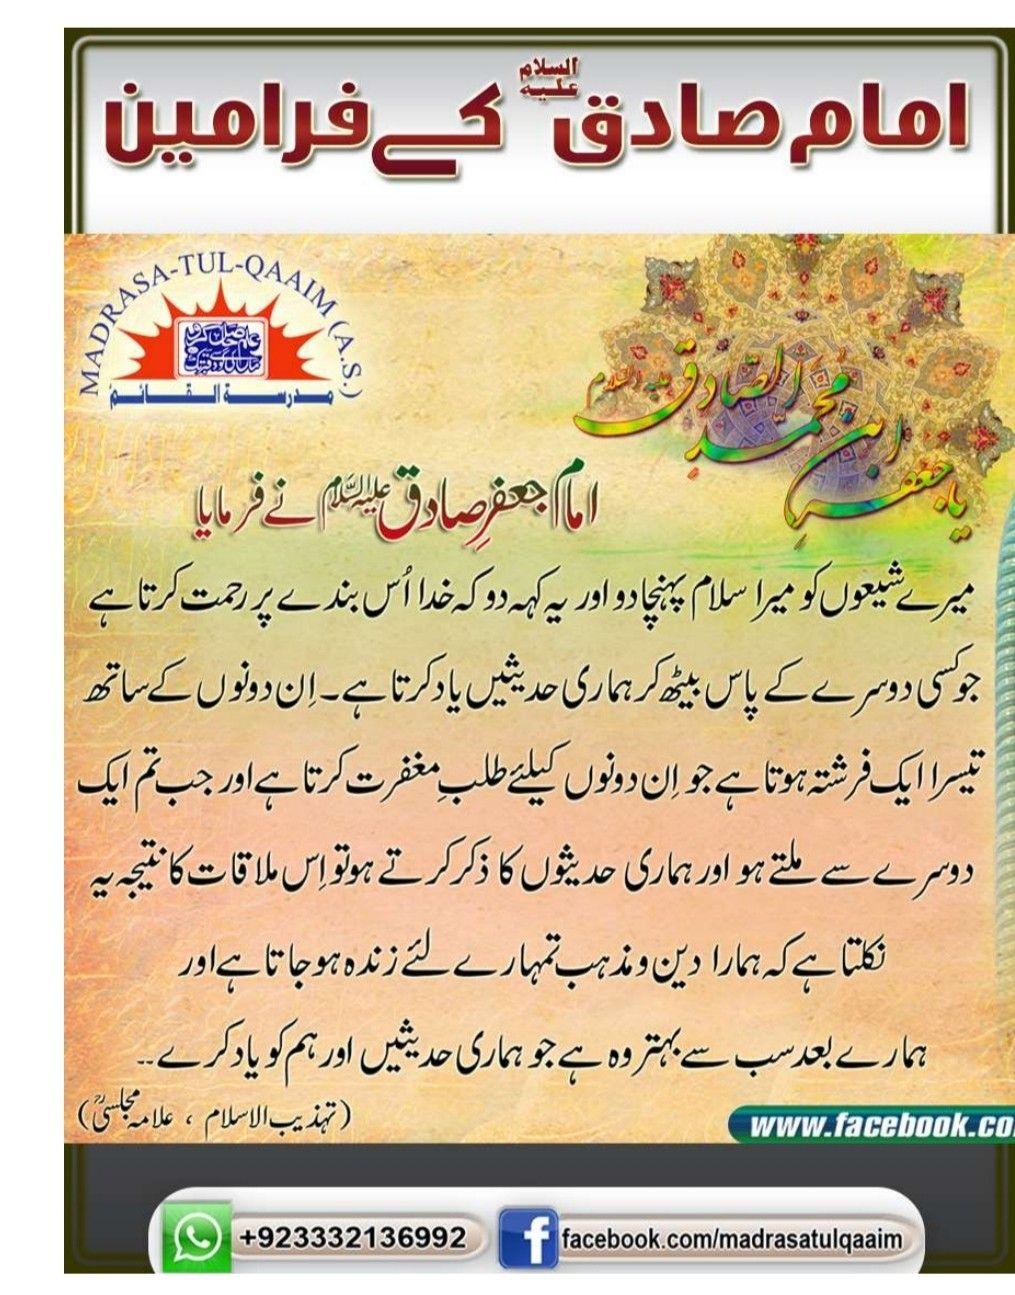 Pin by naqvi s on shia islam shia islam mola ali madrasa